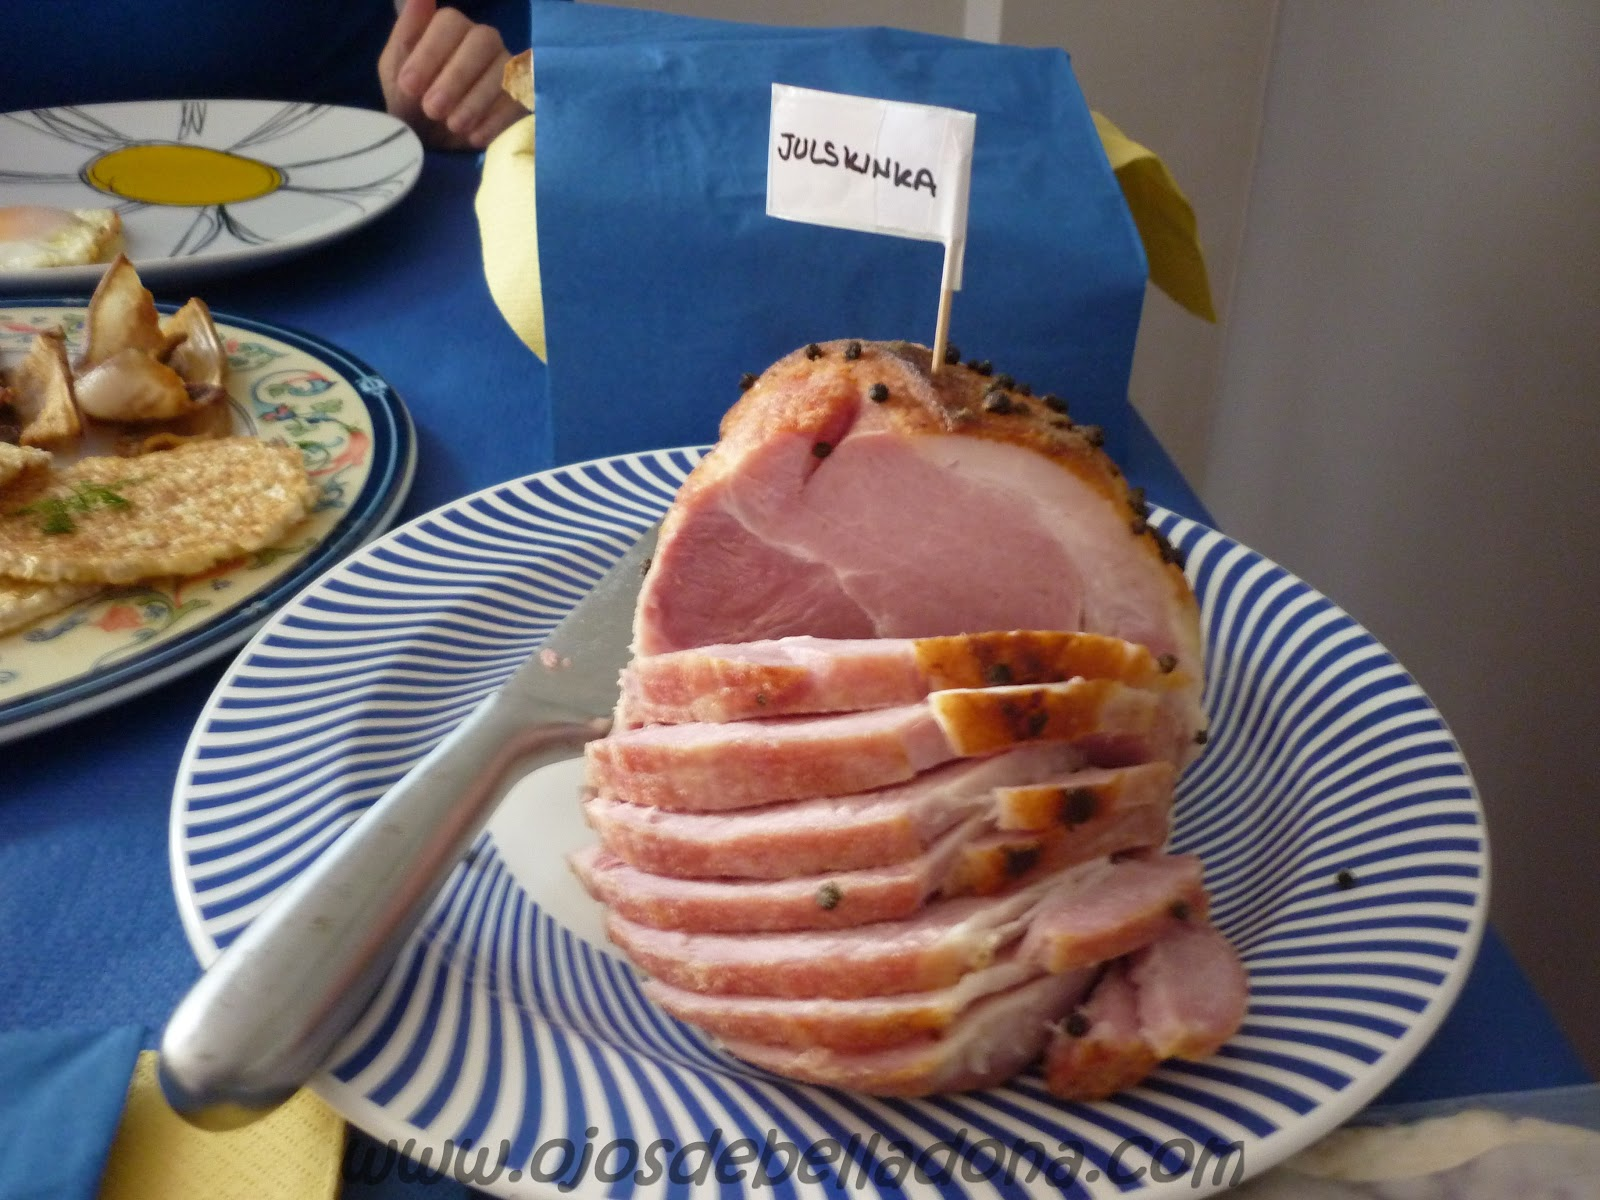 Julskinka o Jamón de Navidad, comidas del mundo, Suecia, sueca